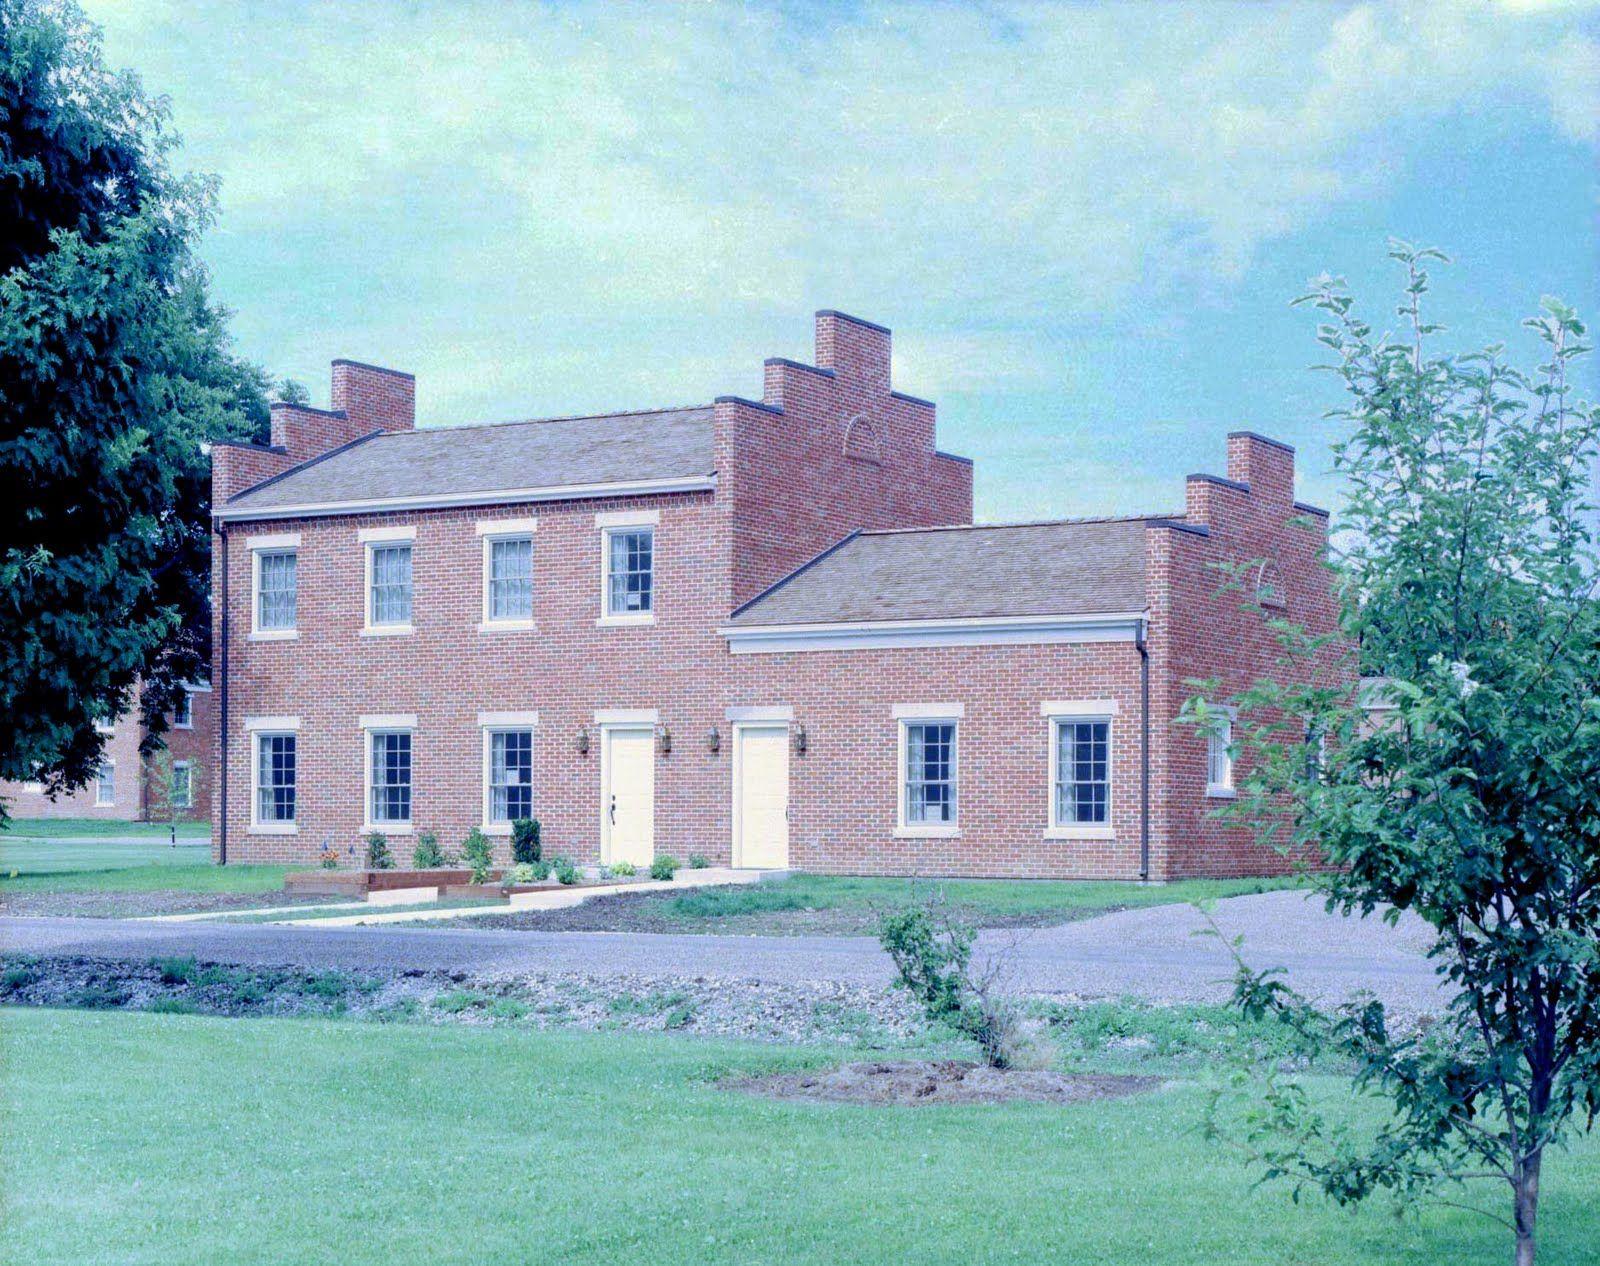 Nauvoo Illinois Joseph Smith Mansion House Nauvoo Illinois Photos Then And Now On Church History Sites Nauvoo Joseph Smith